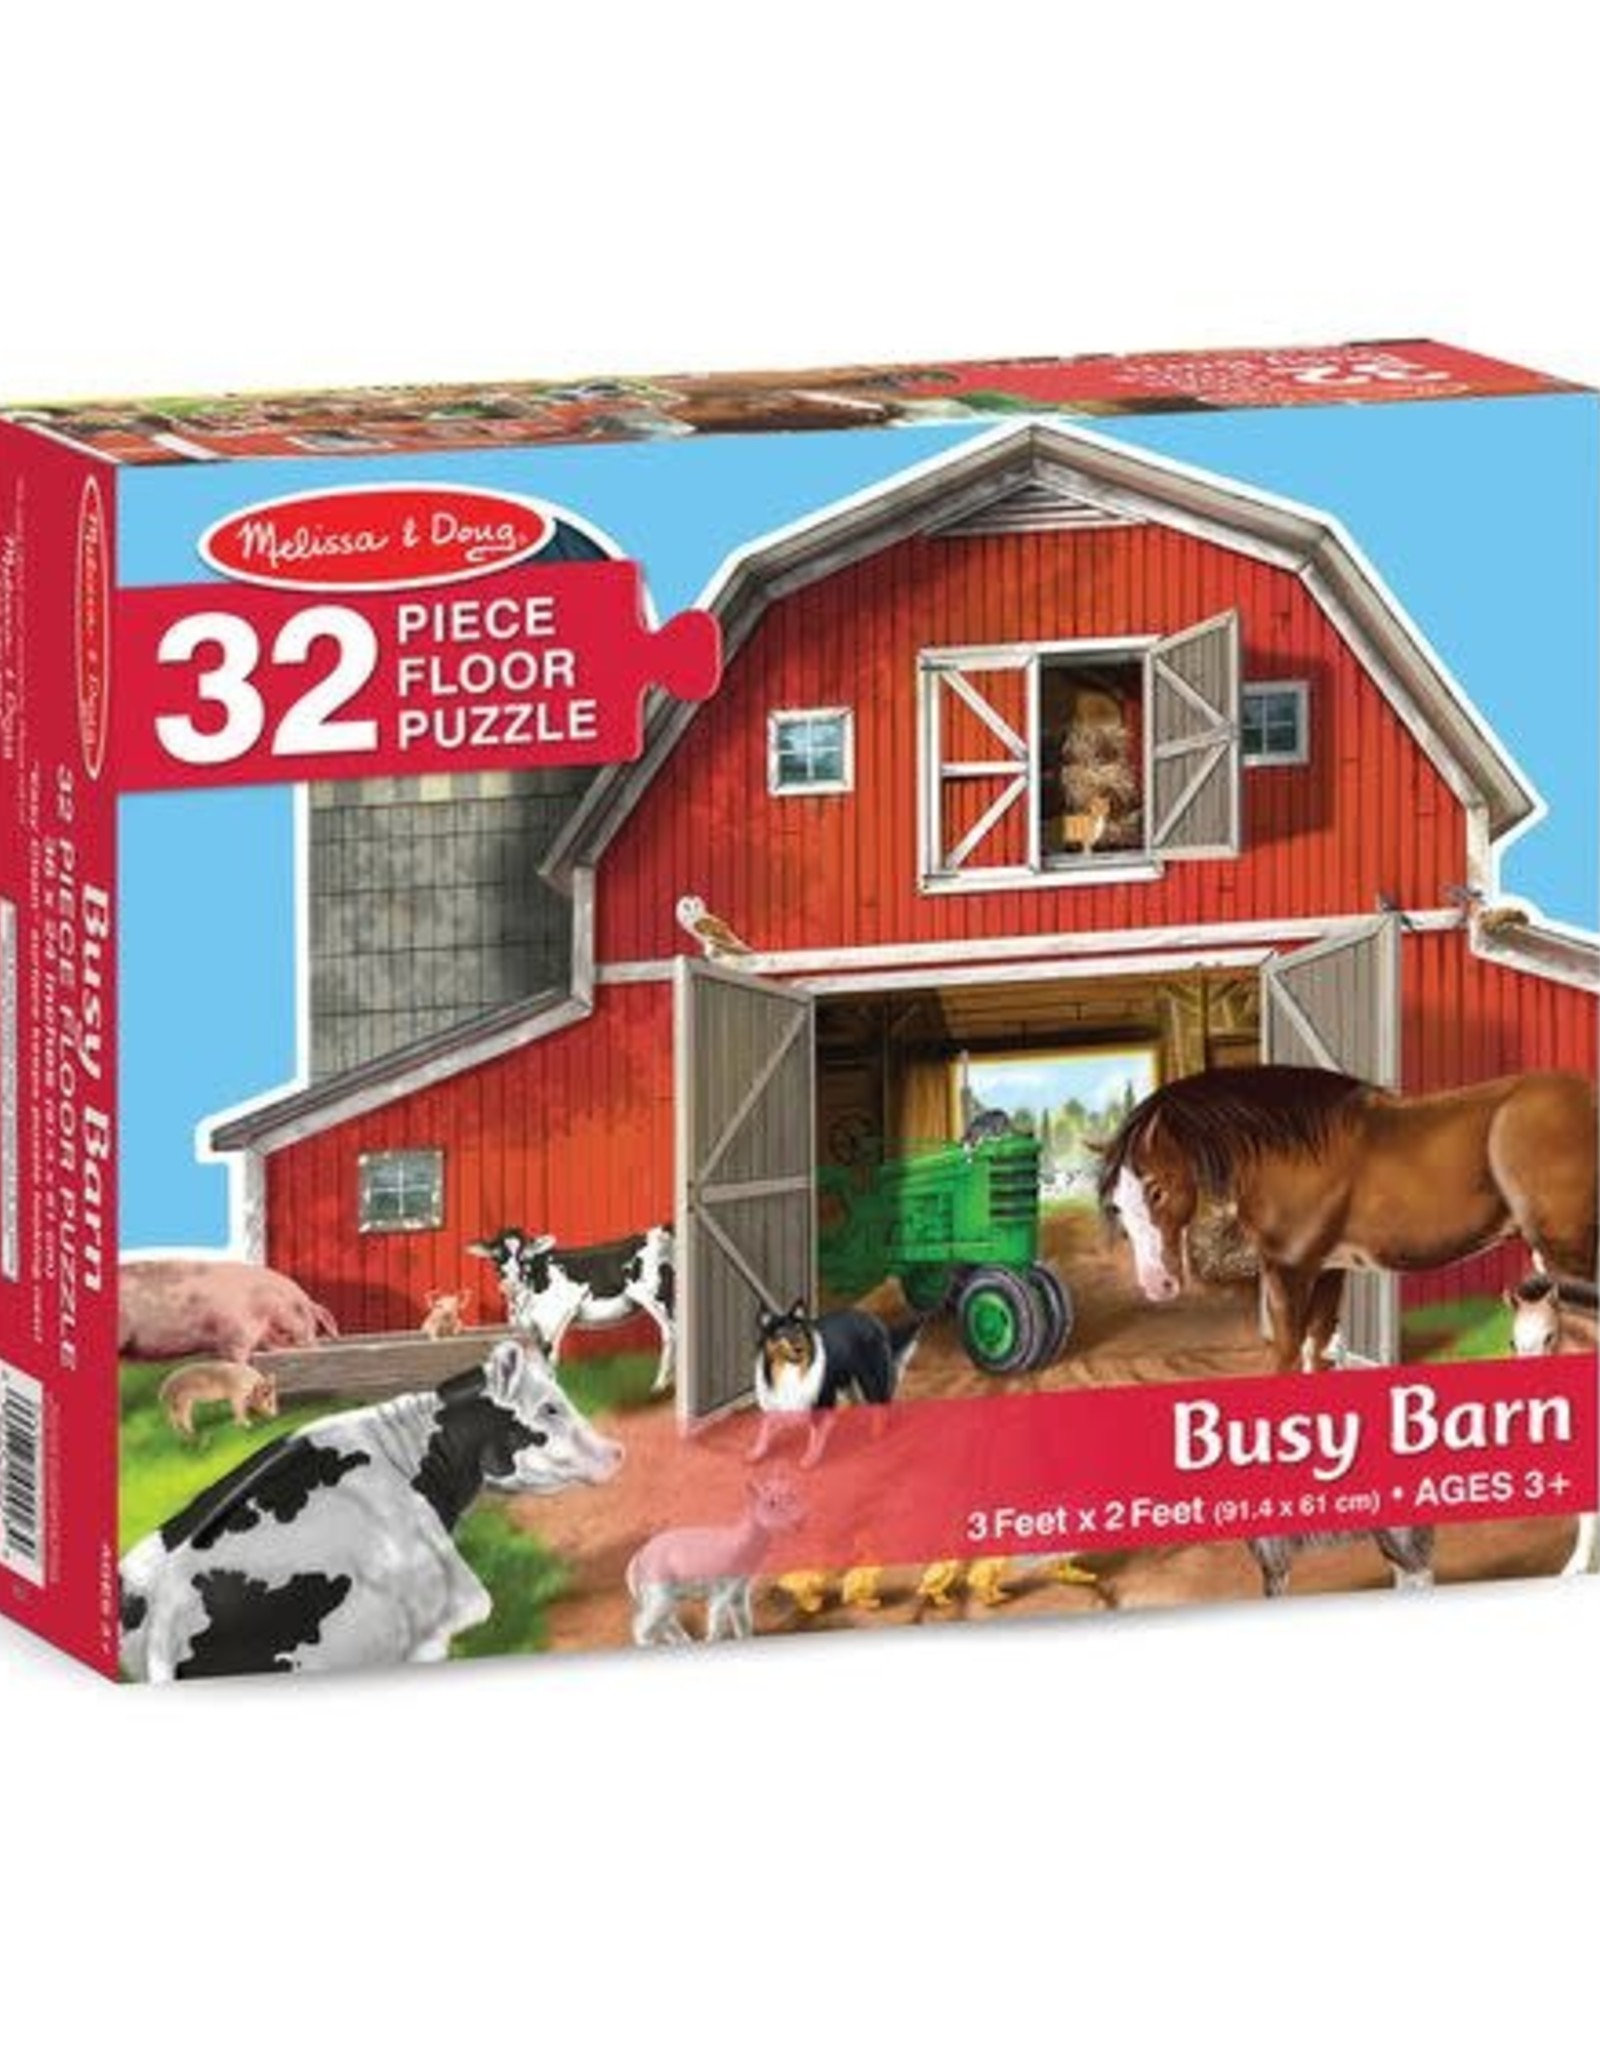 Melissa & Doug Melissa & Doug Busy Barn 32pc Floor Puzzle